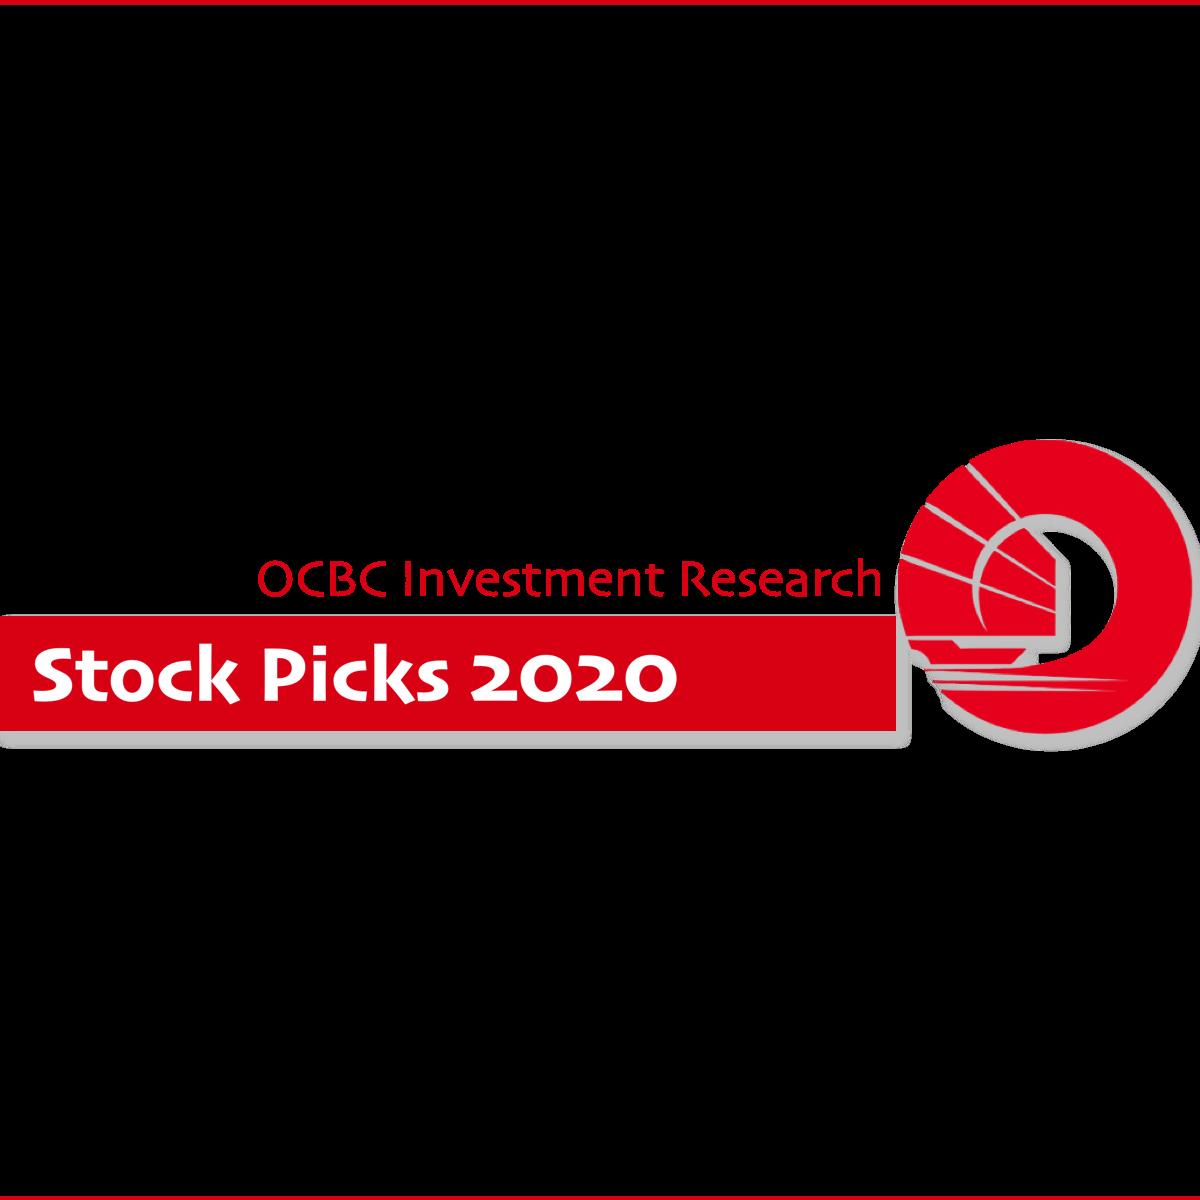 Stock Picks 2020 - OCBC Investment Research | SGinvestors.io